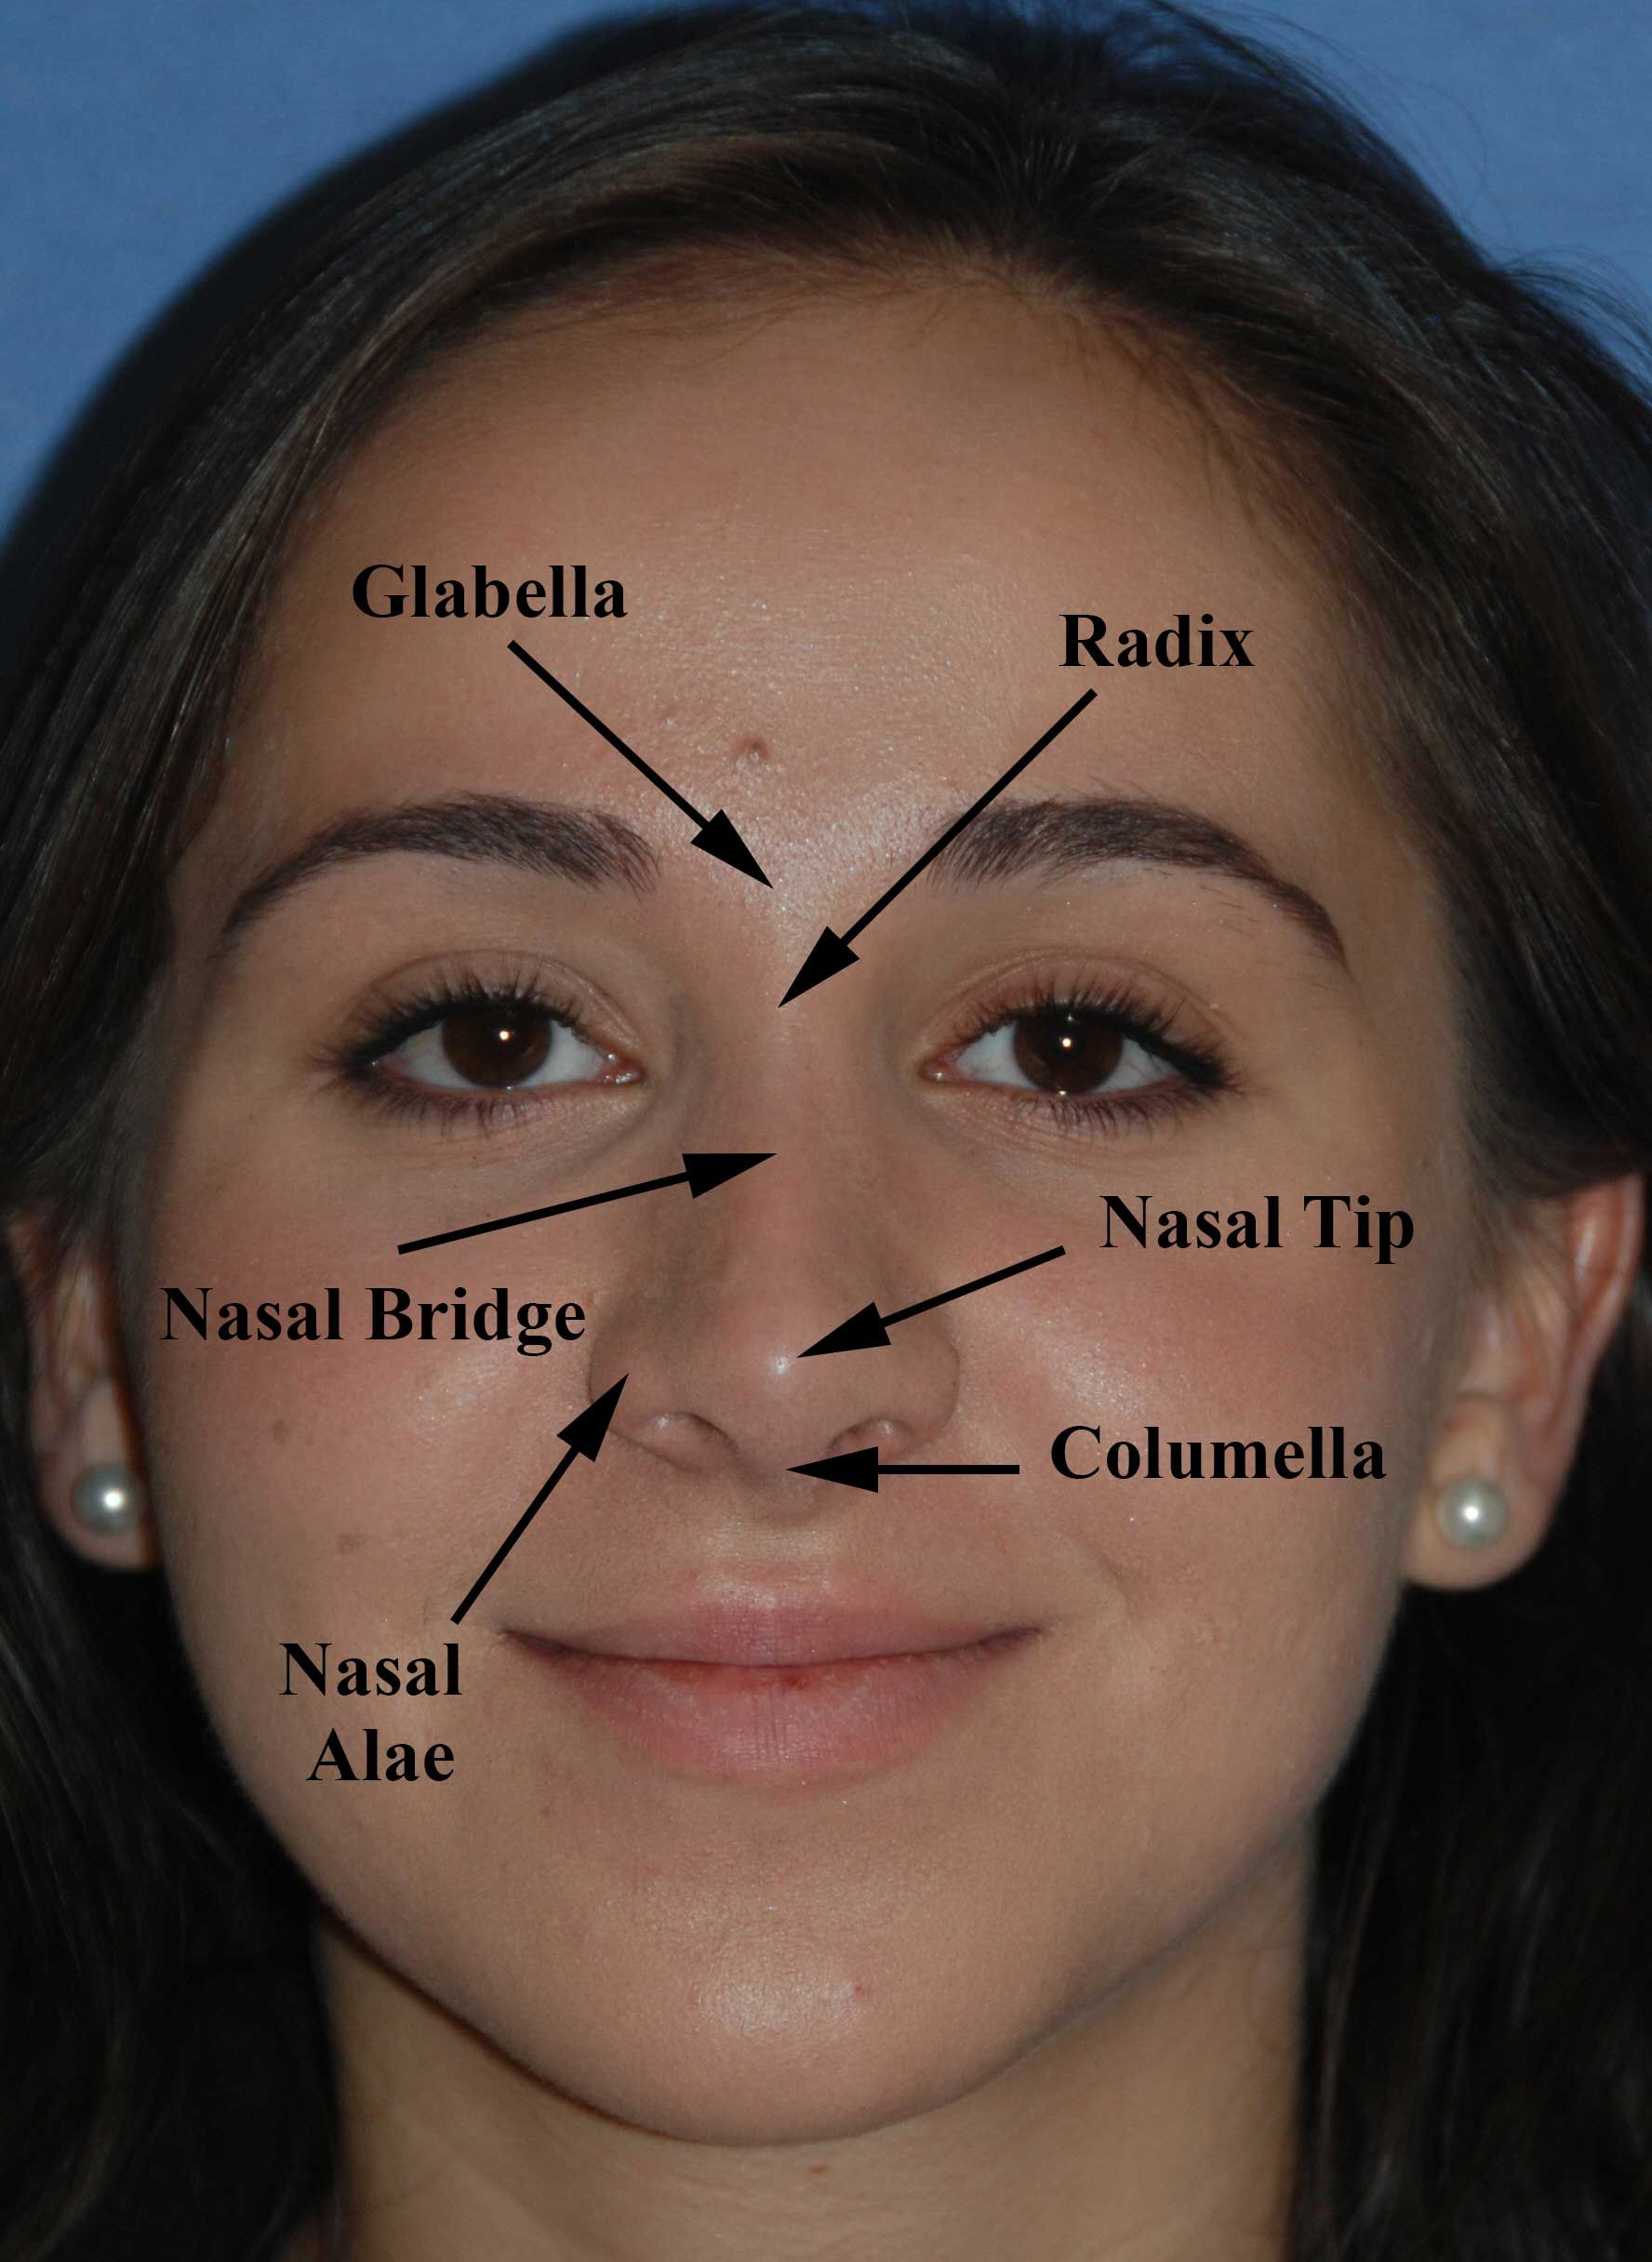 Anatomical Parts Of Nose Google Search Gesigte En Figure